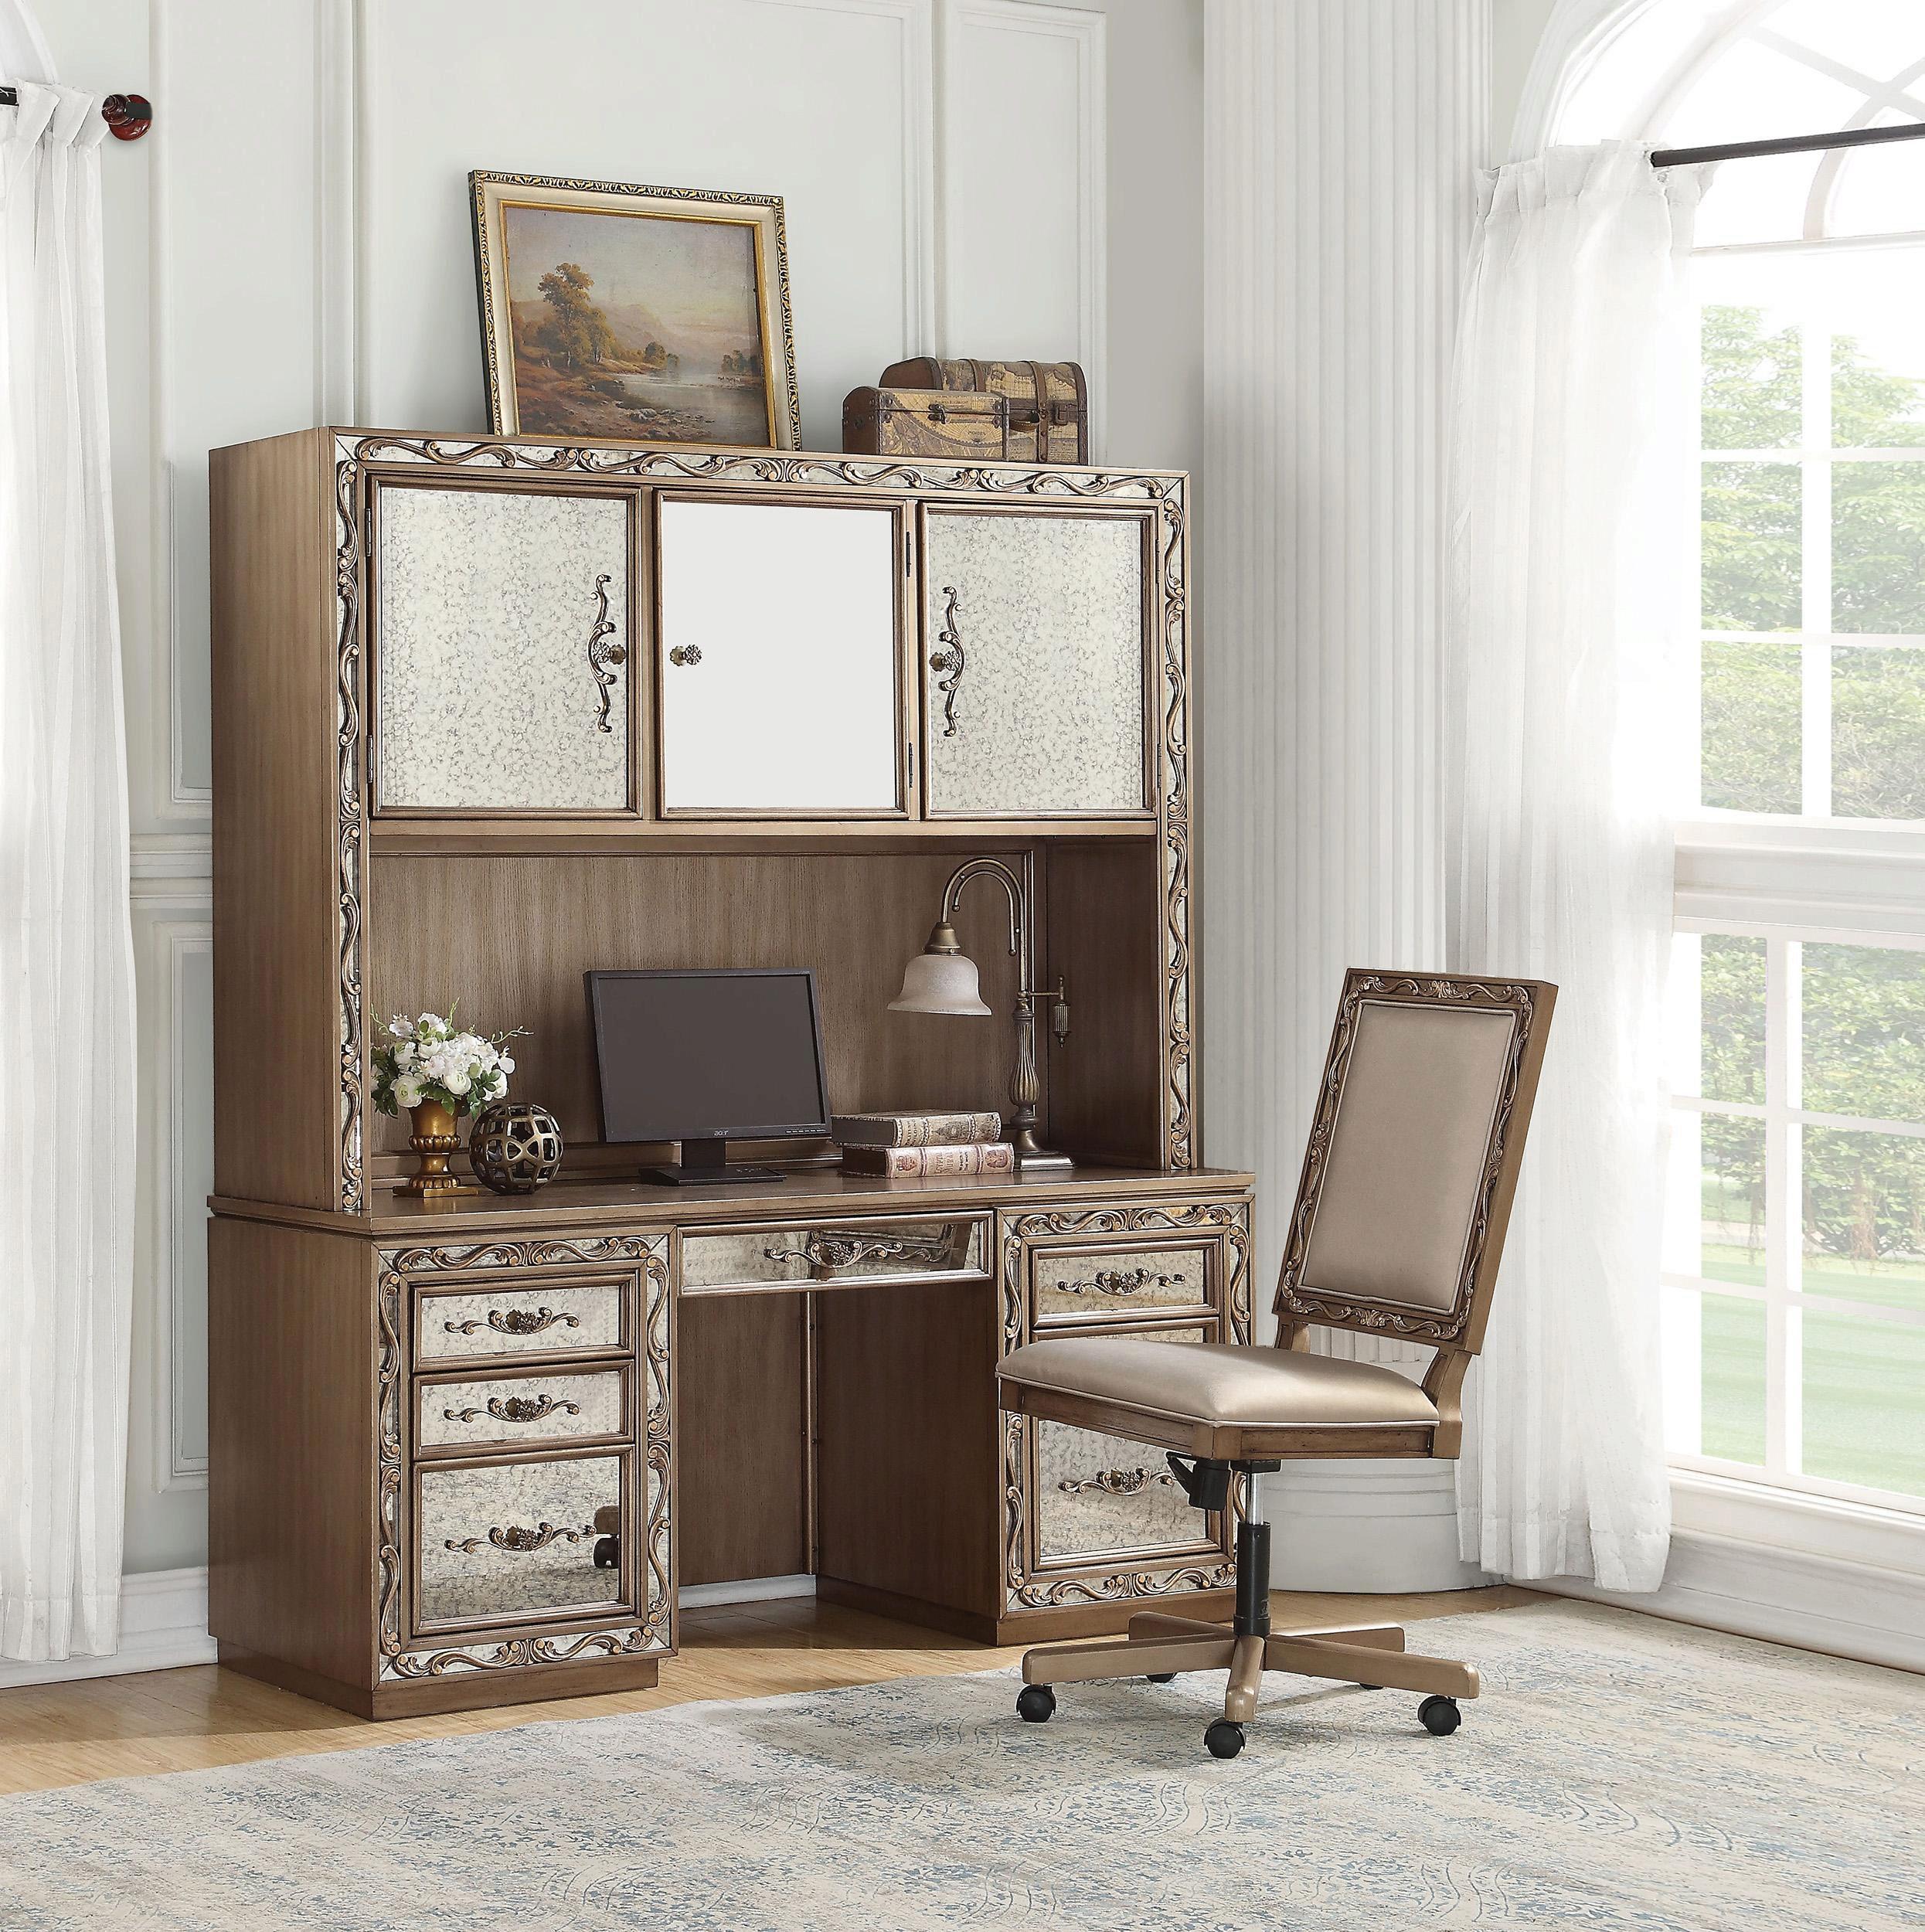 Home Office Computer Desk Hutch Set 2 Antique Champagne 93790 Orianne Acme Orianne 93790 91437